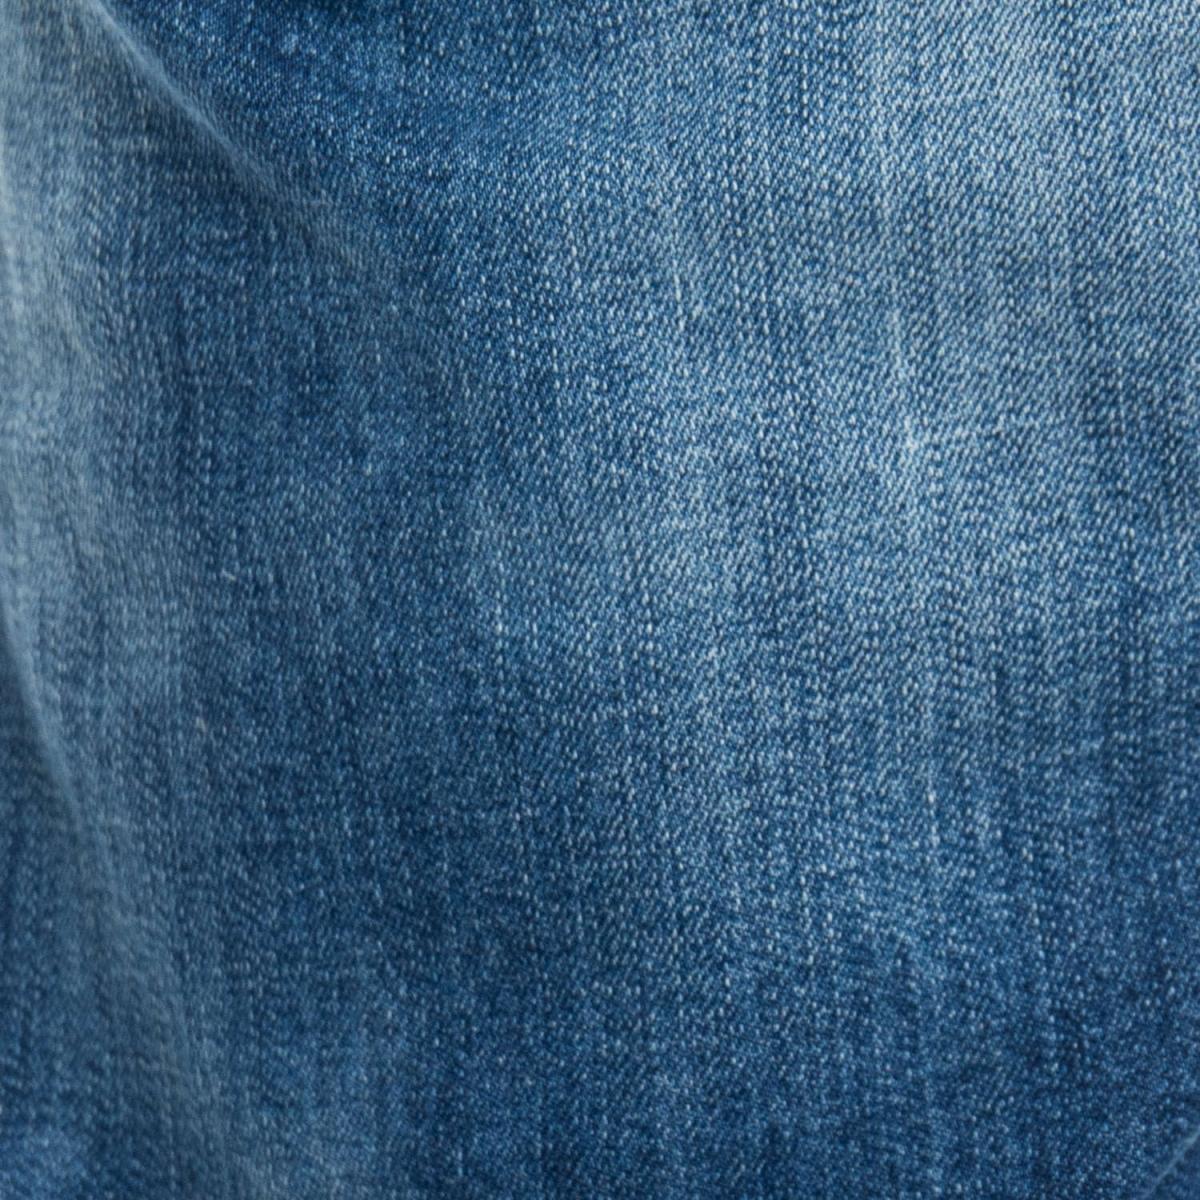 abbigliamento Jeans uomo Jeans Slim Fit LPY1799 LANDEK PARK Cafedelmar Shop